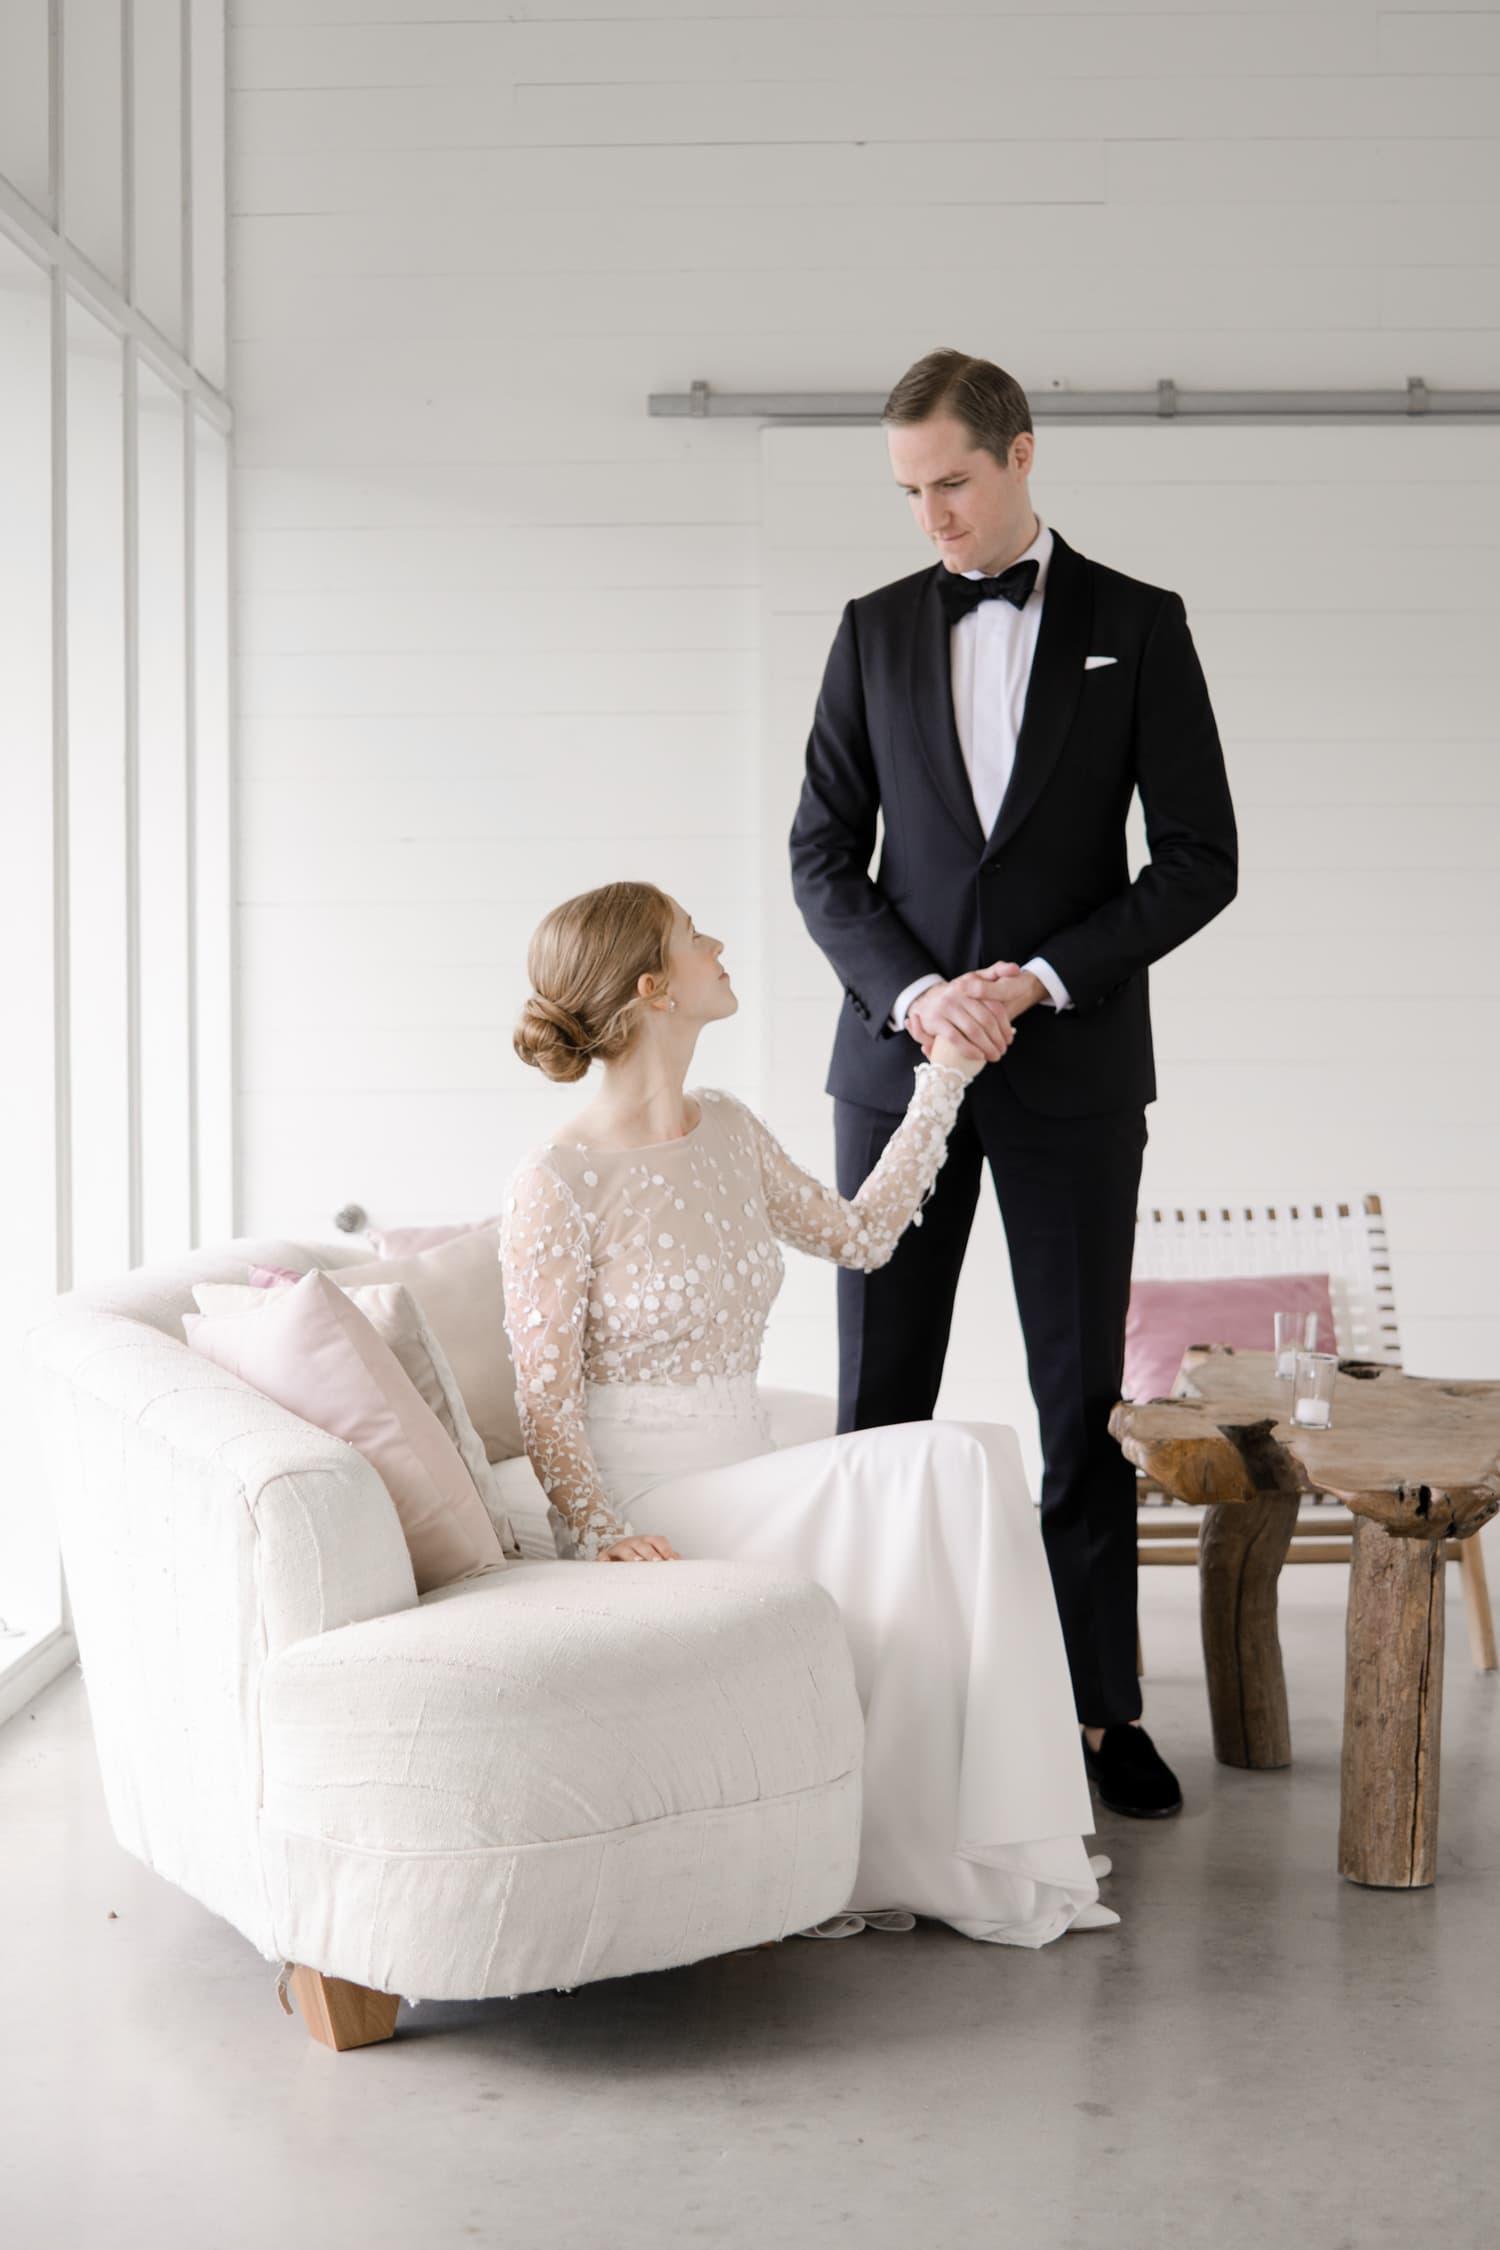 PROSPECT_HOUSE_WEDDING_AUSTIN_TX_MATTHEW_MOORE-00164.jpg